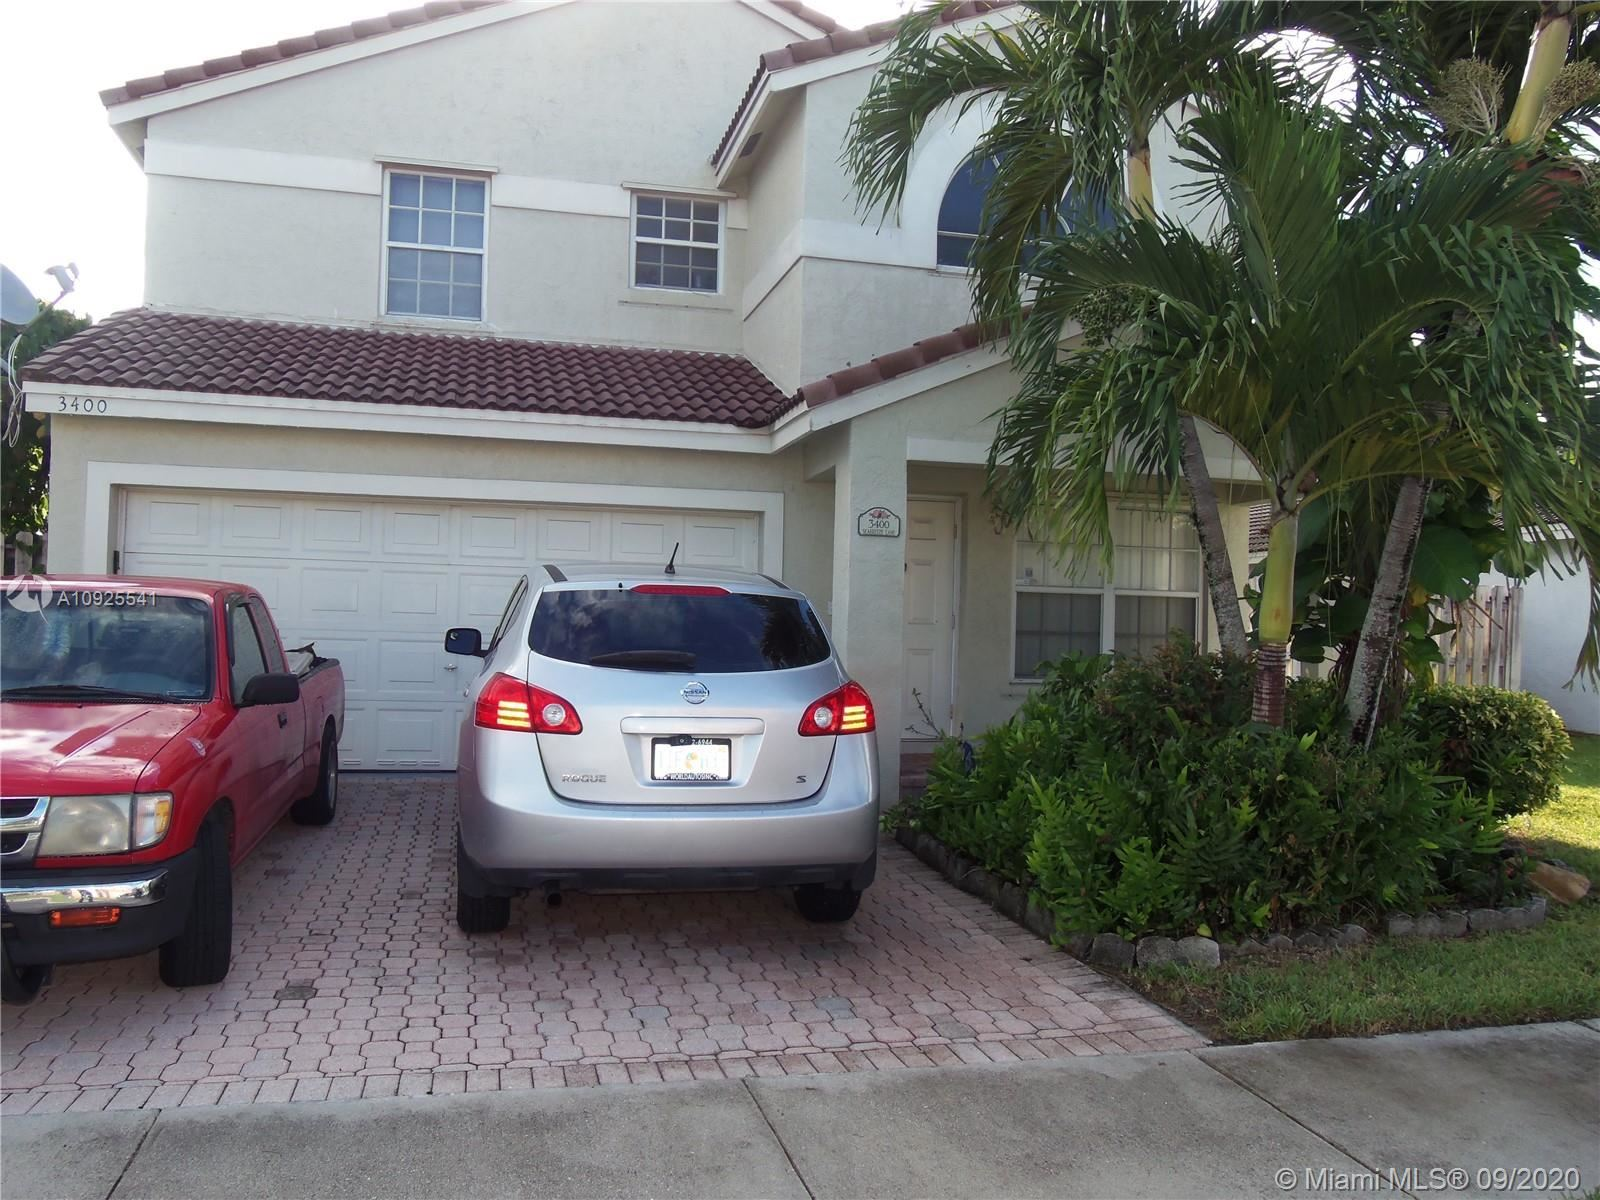 Photo of 3400 Seabreeze Ln, Margate, FL 33063 (MLS # A10925541)